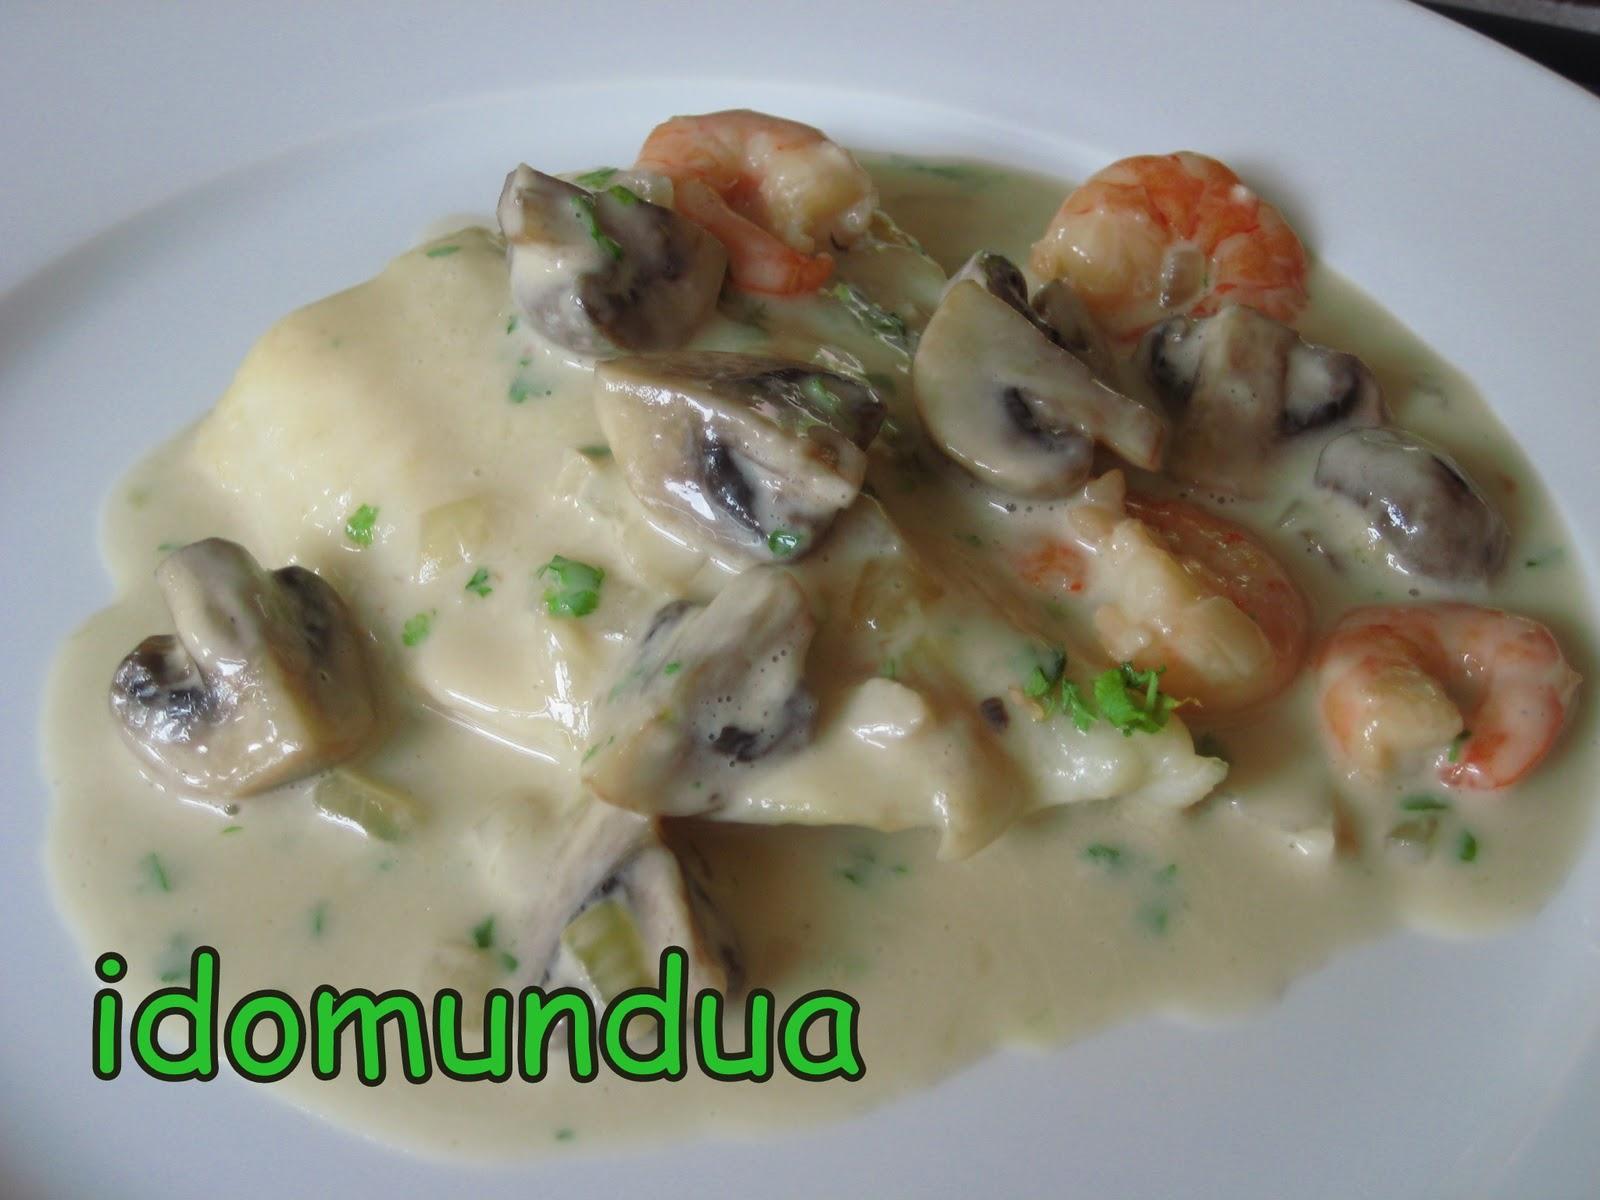 Como Cocinar Panga | Idomundua Panga Con Champinones Y Gambas